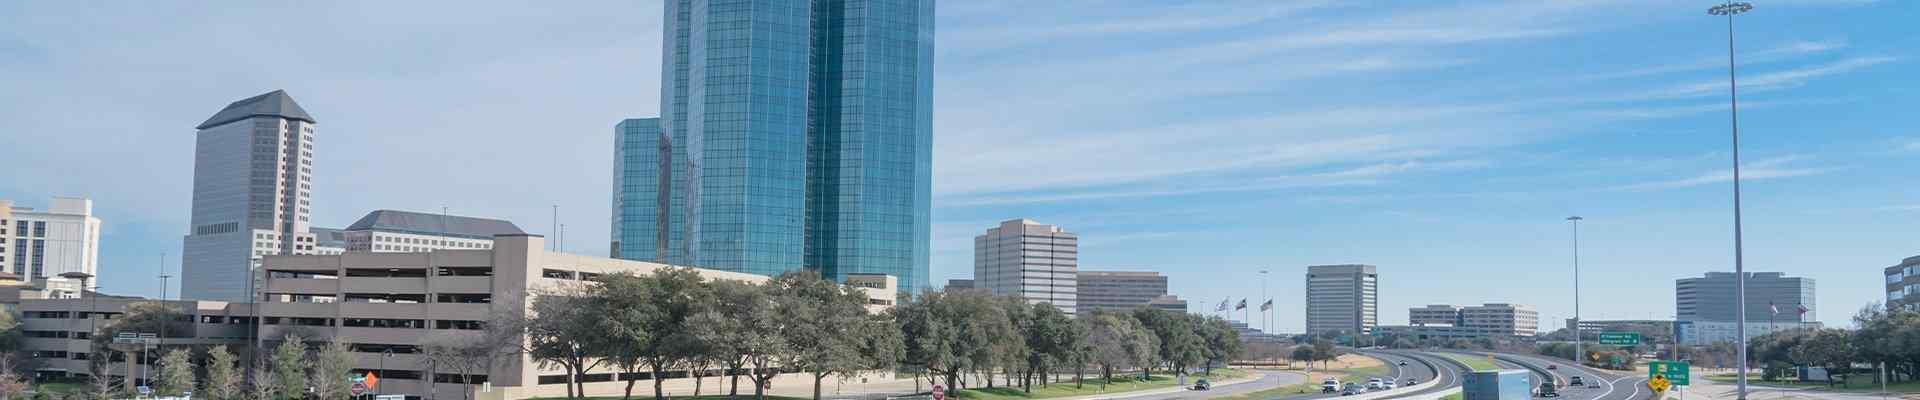 skyline of irving texas